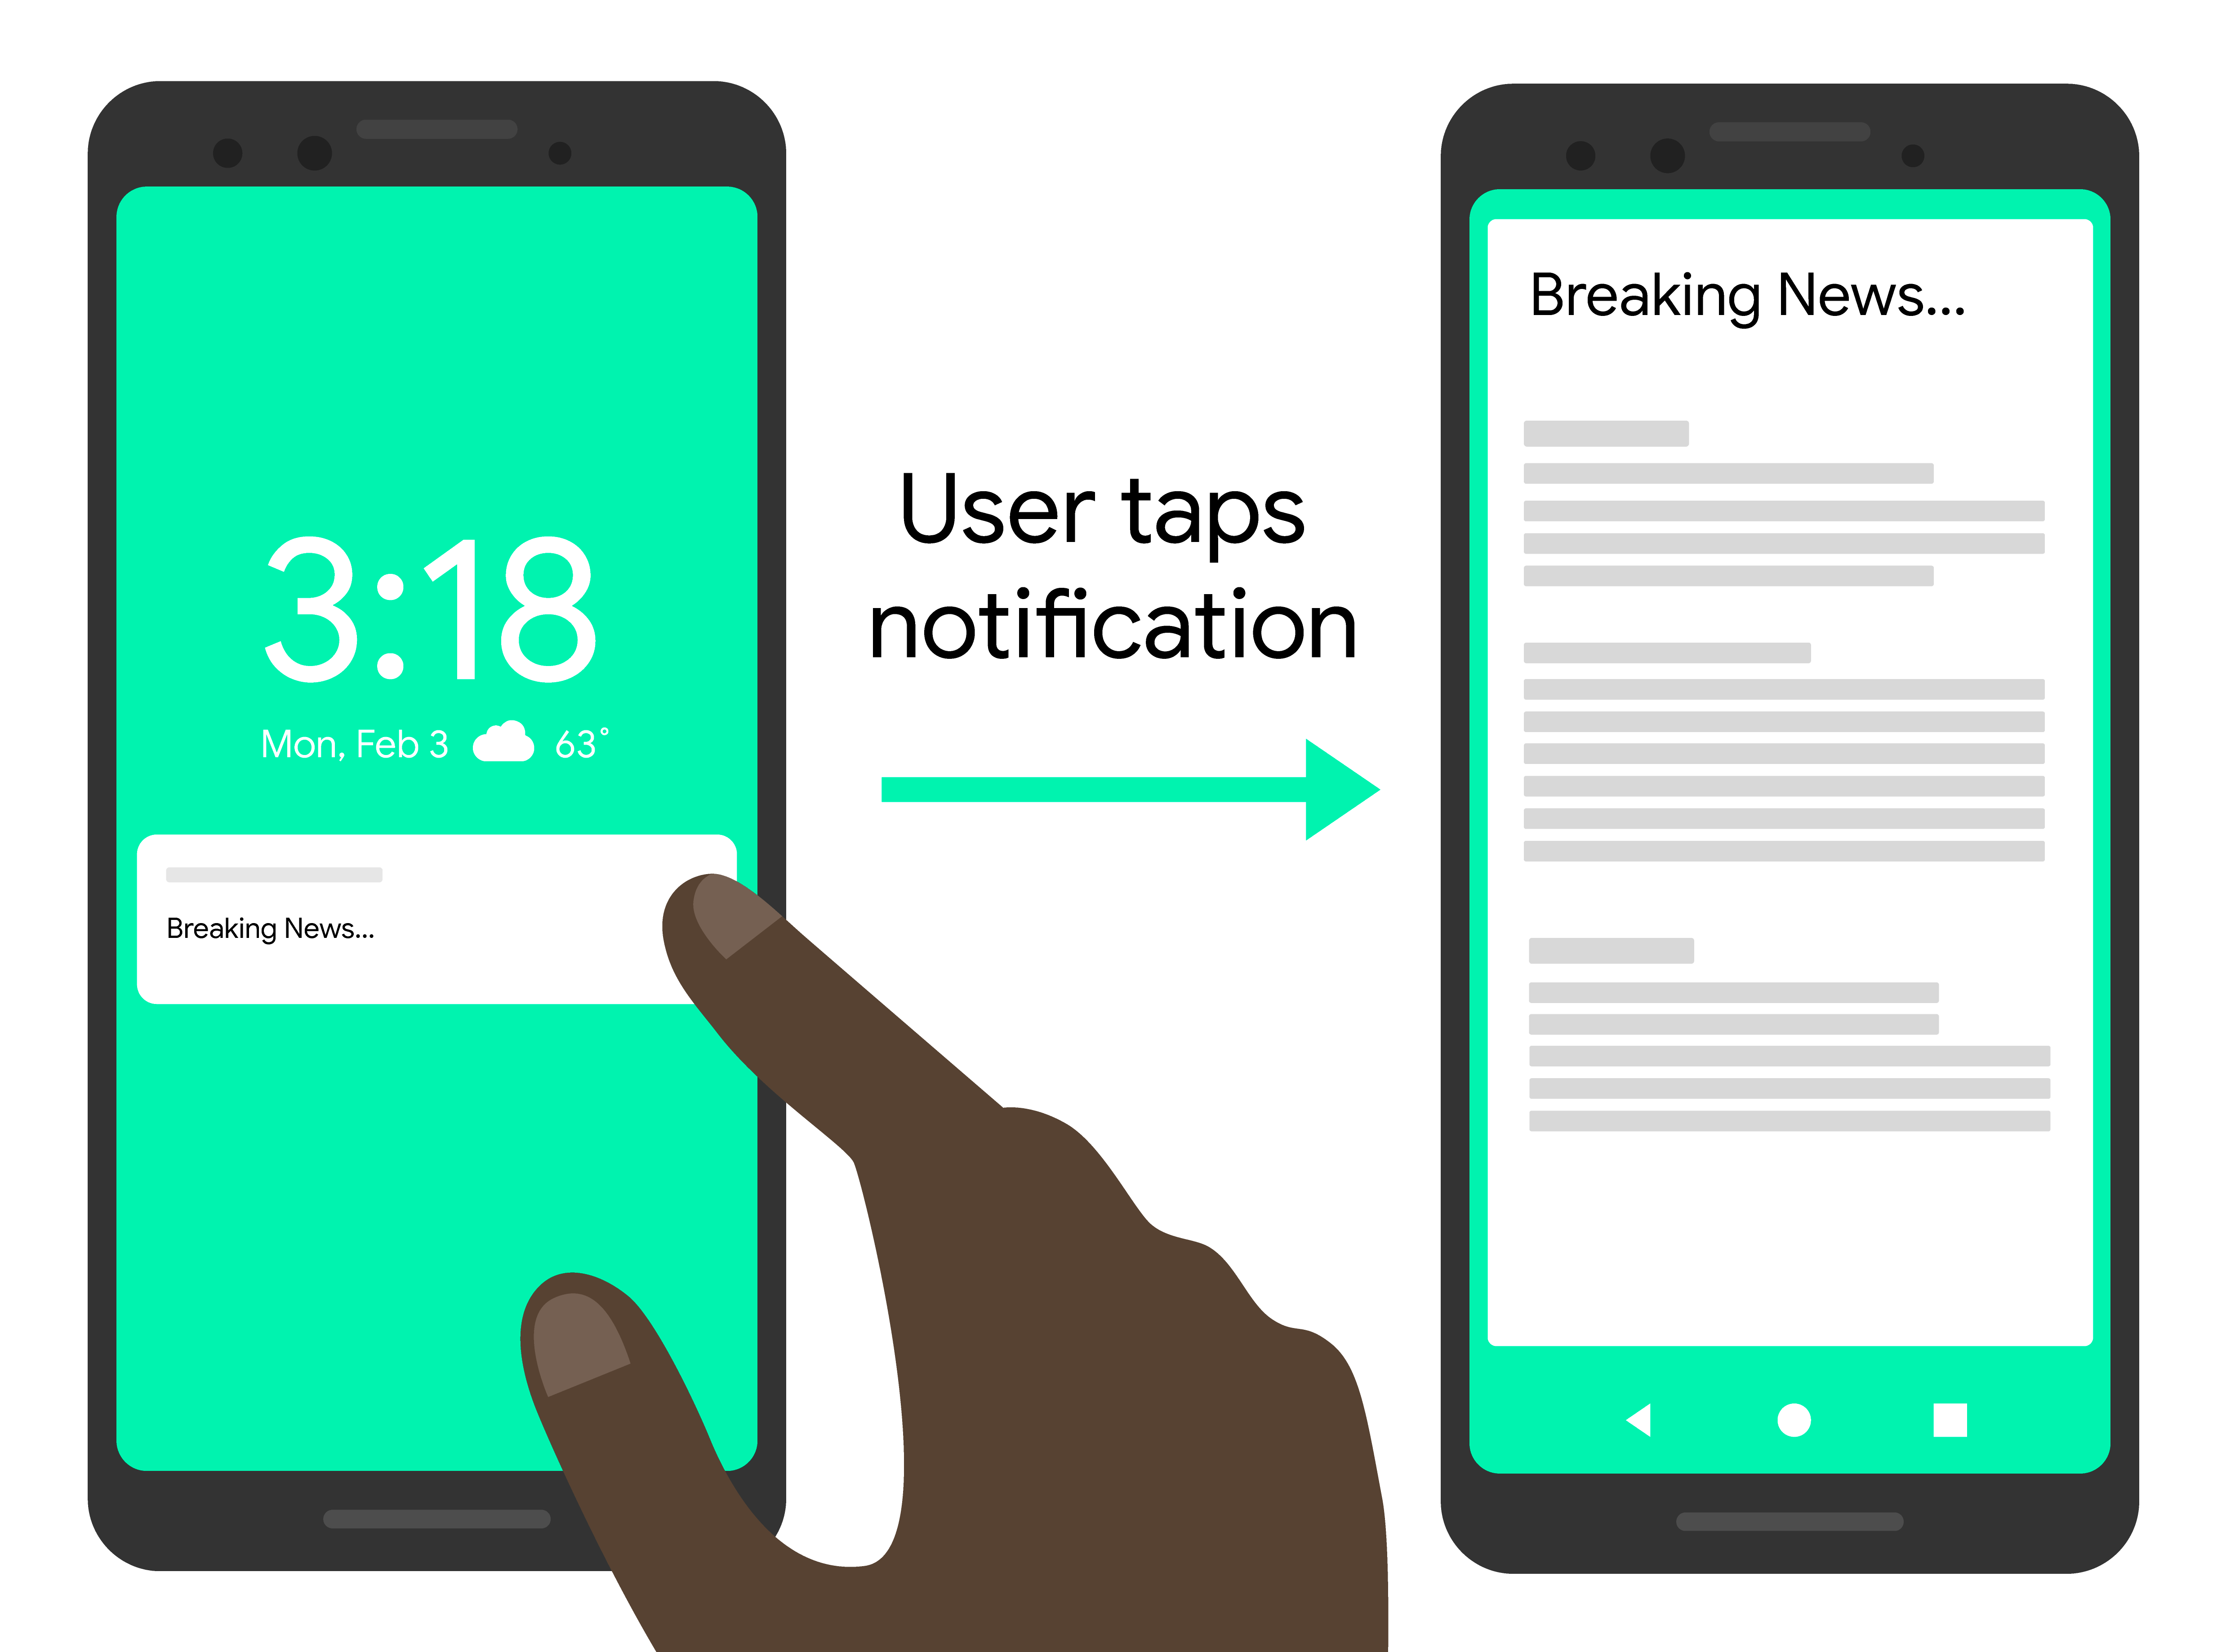 एक वेब पेज खोलने वाले उपयोगकर्ता टैप का सरल आरेखण